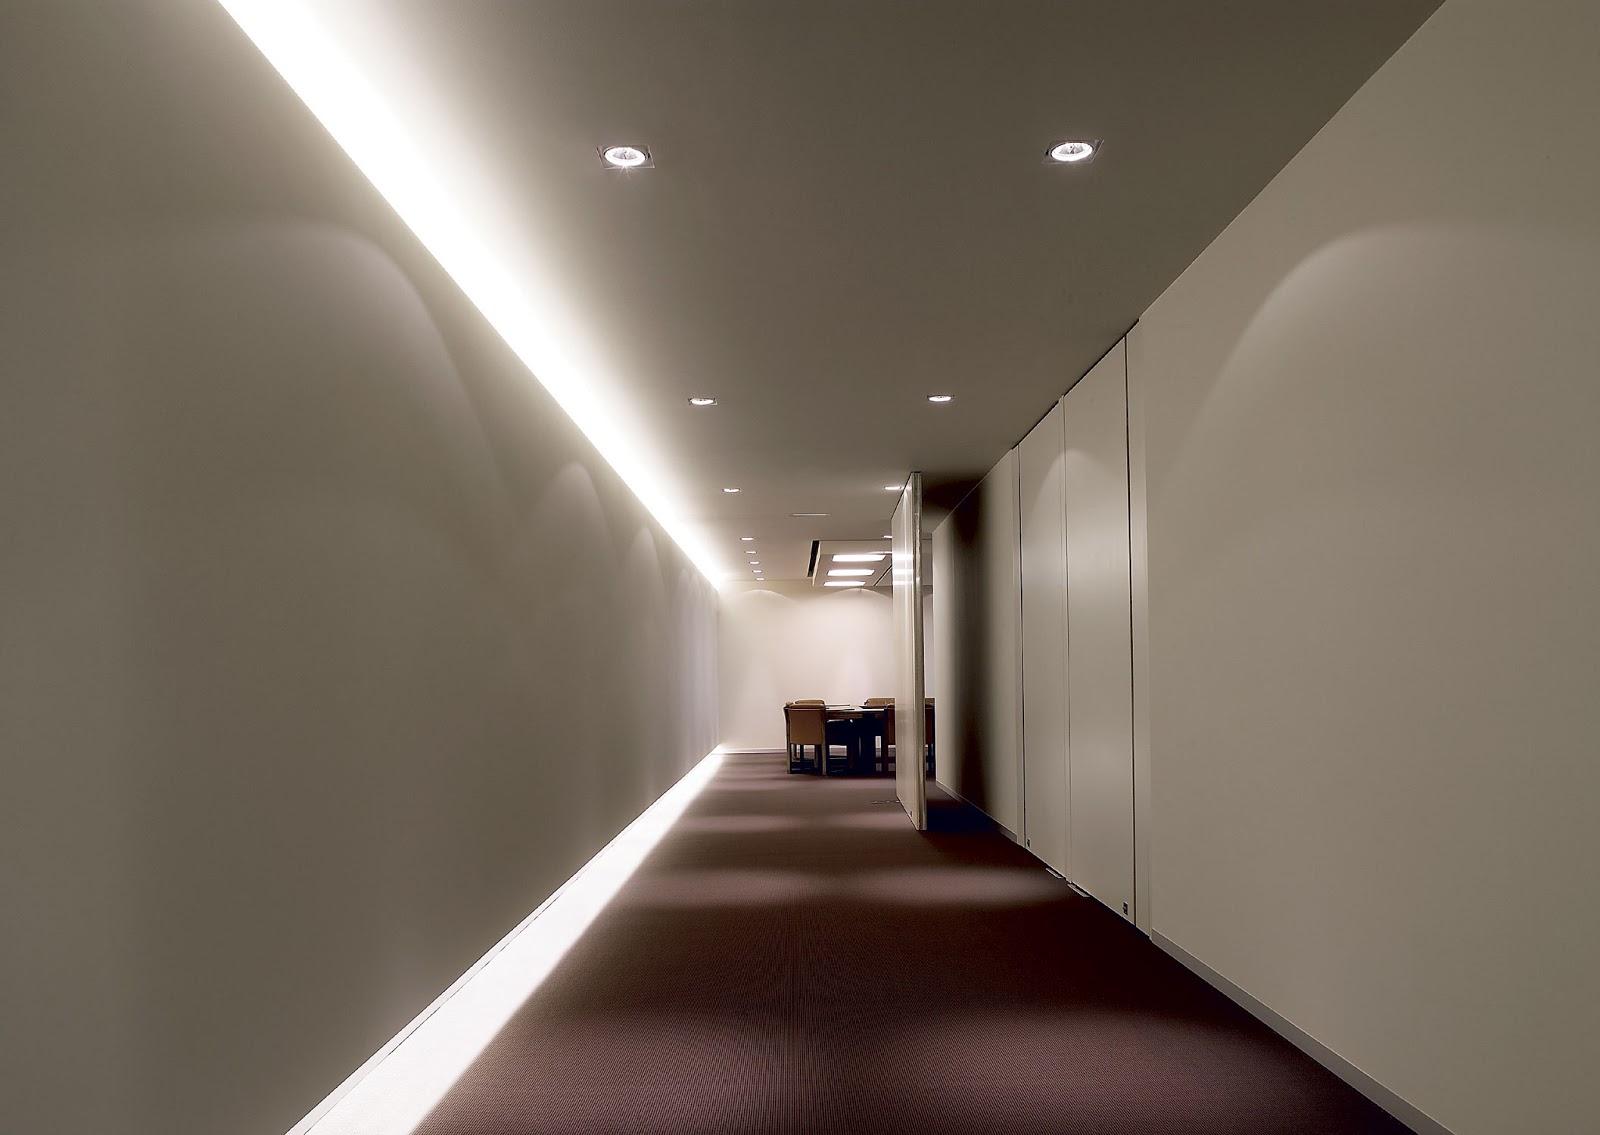 Delta light latin america hospitality pasillos for Diseno pasillos interiores